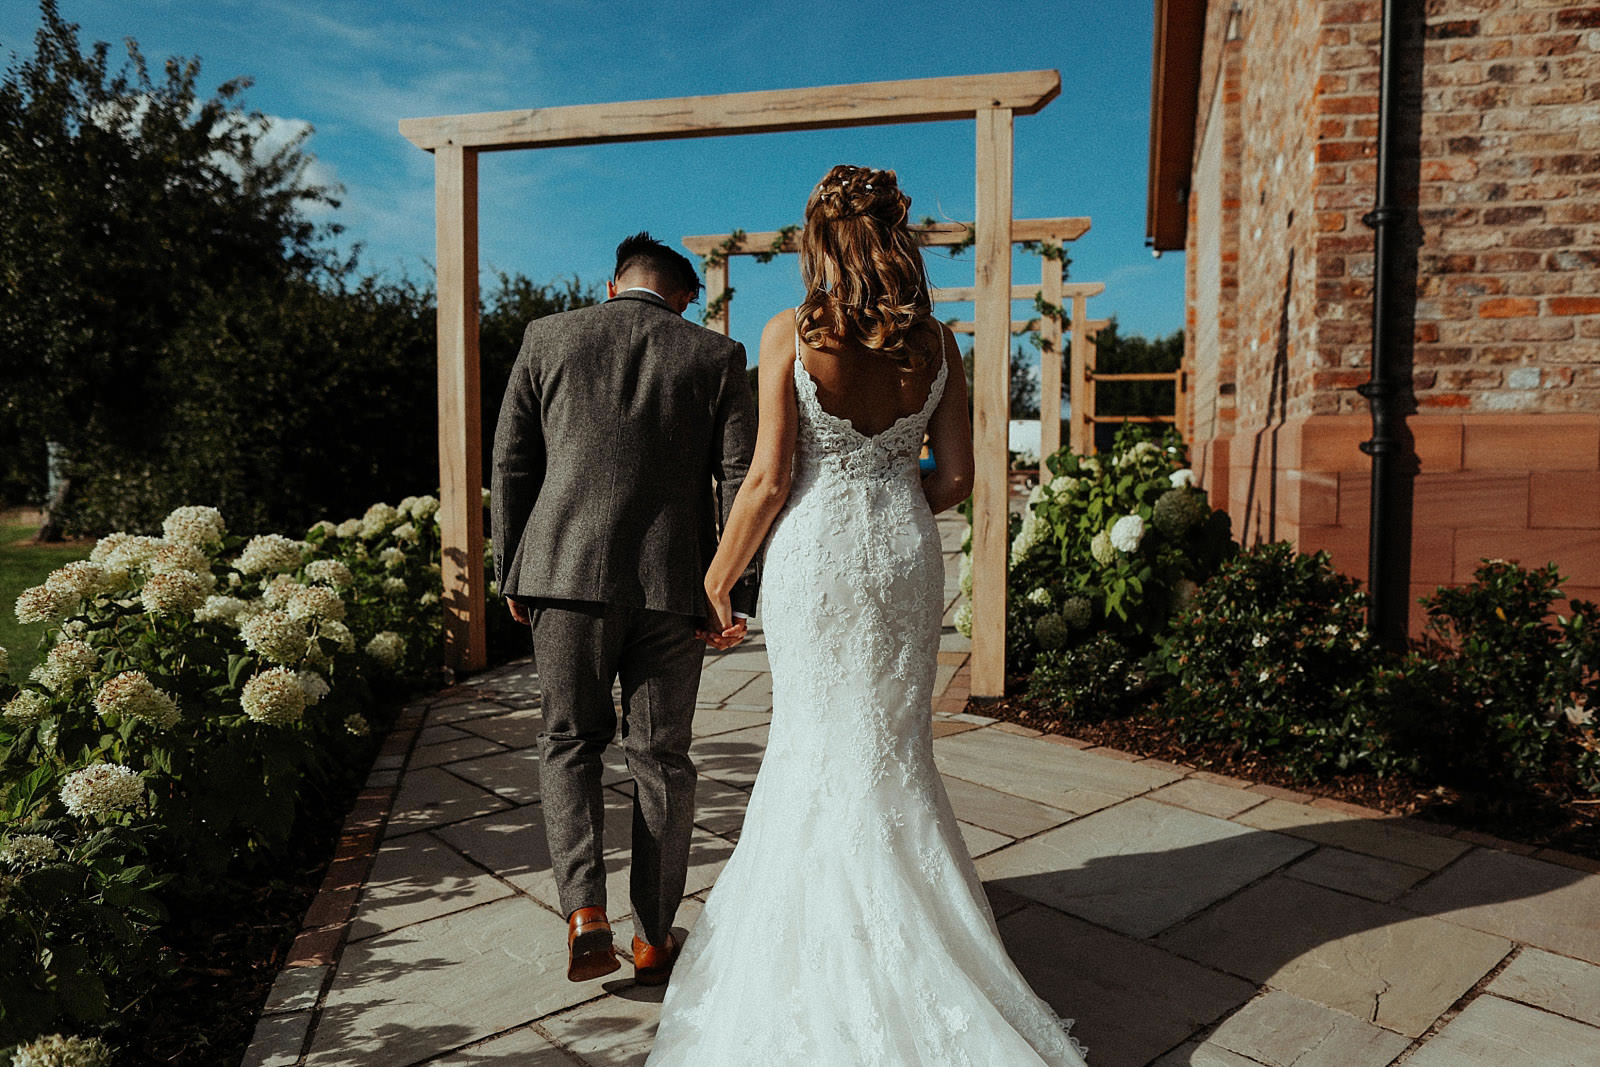 Pryors-Hayes-Wedding-Photography-Barn-Venue-Cheshire-embee-photography-0135.jpg